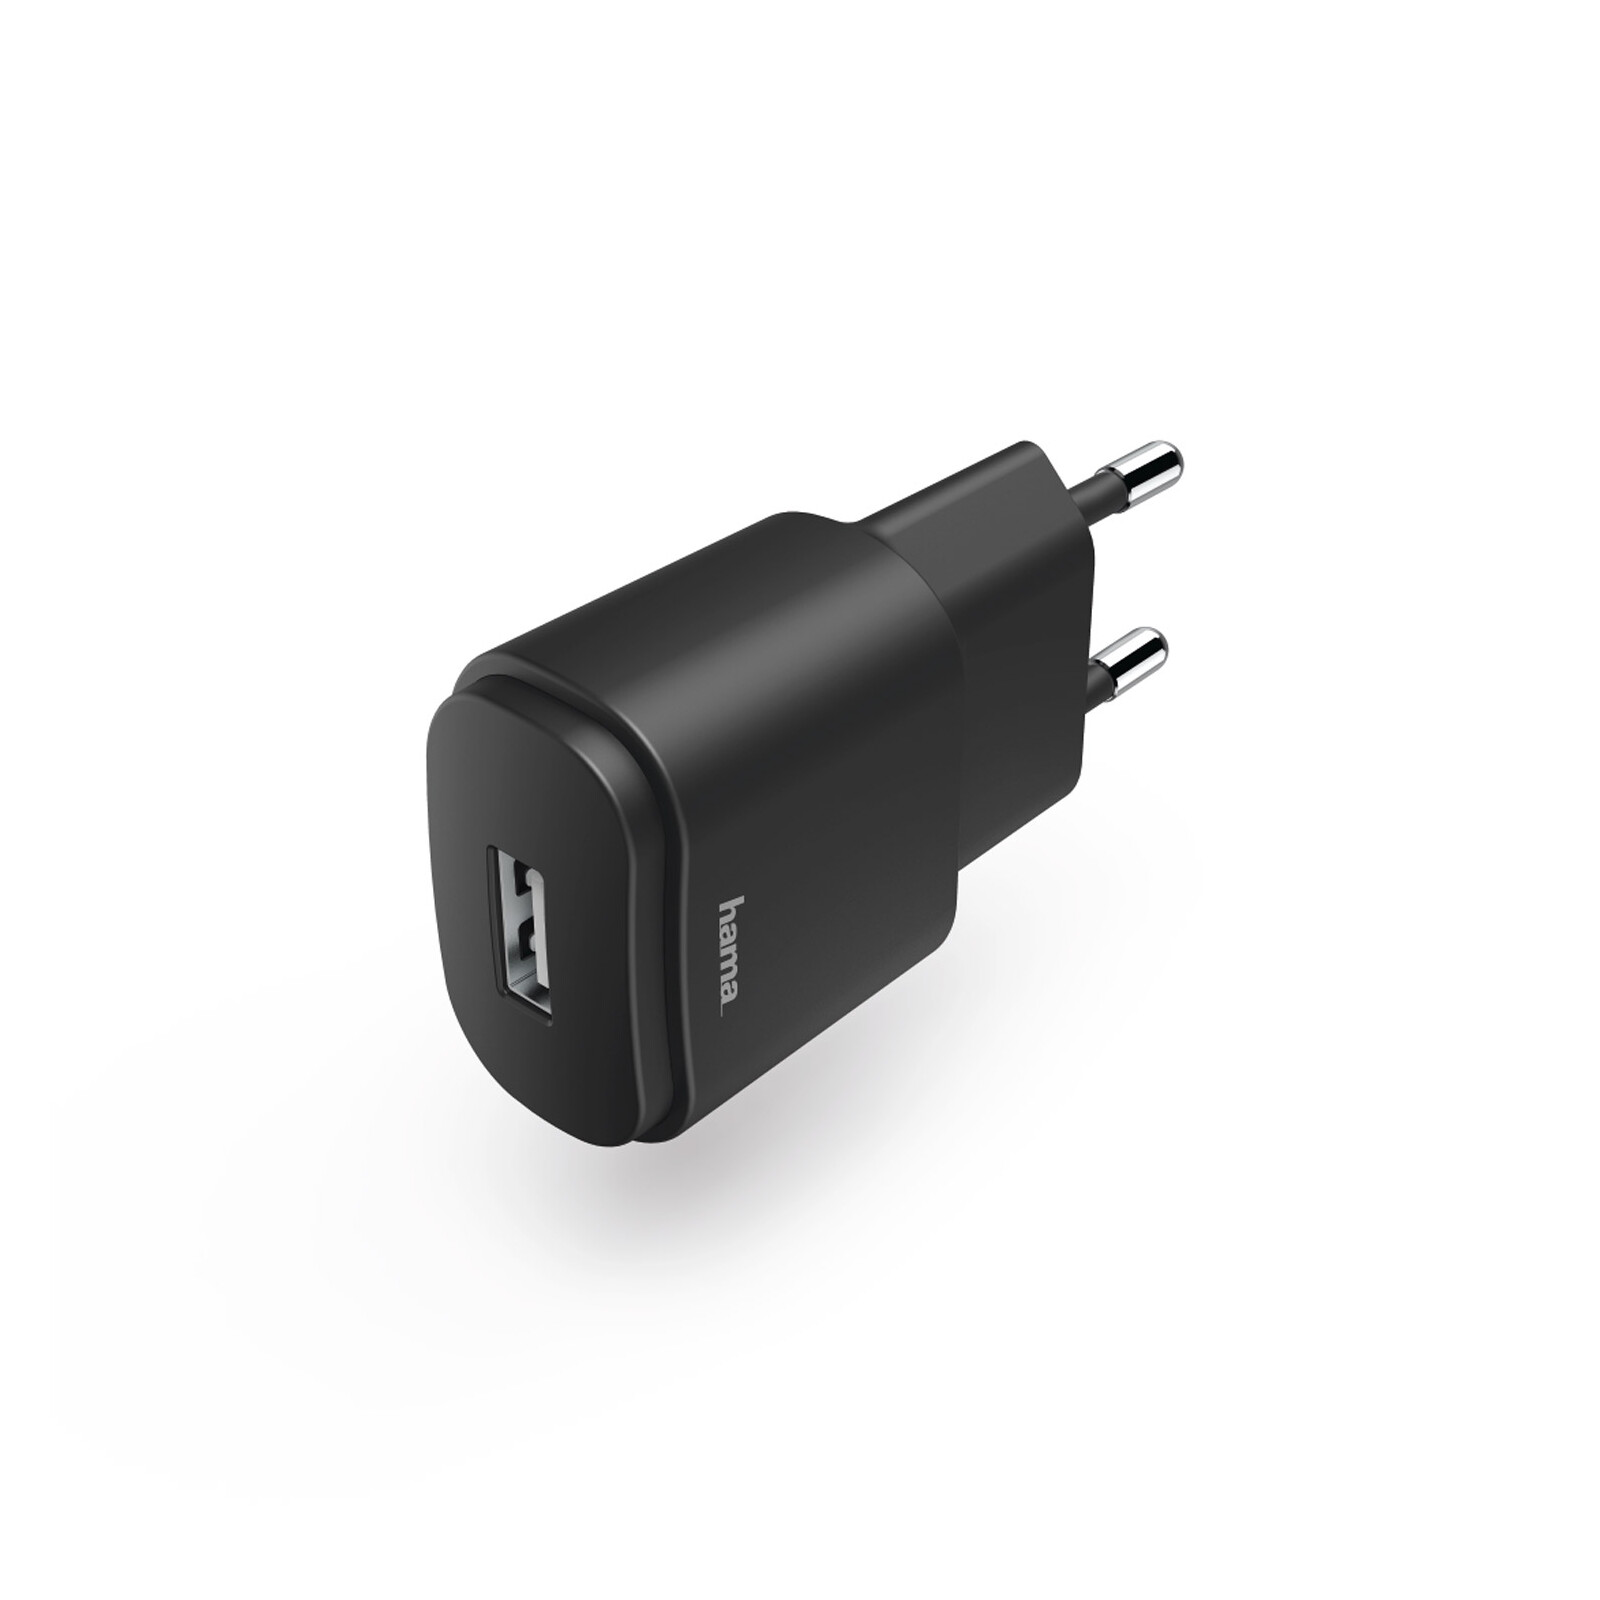 Hama USB-Ladegerät 1/2A schwarz